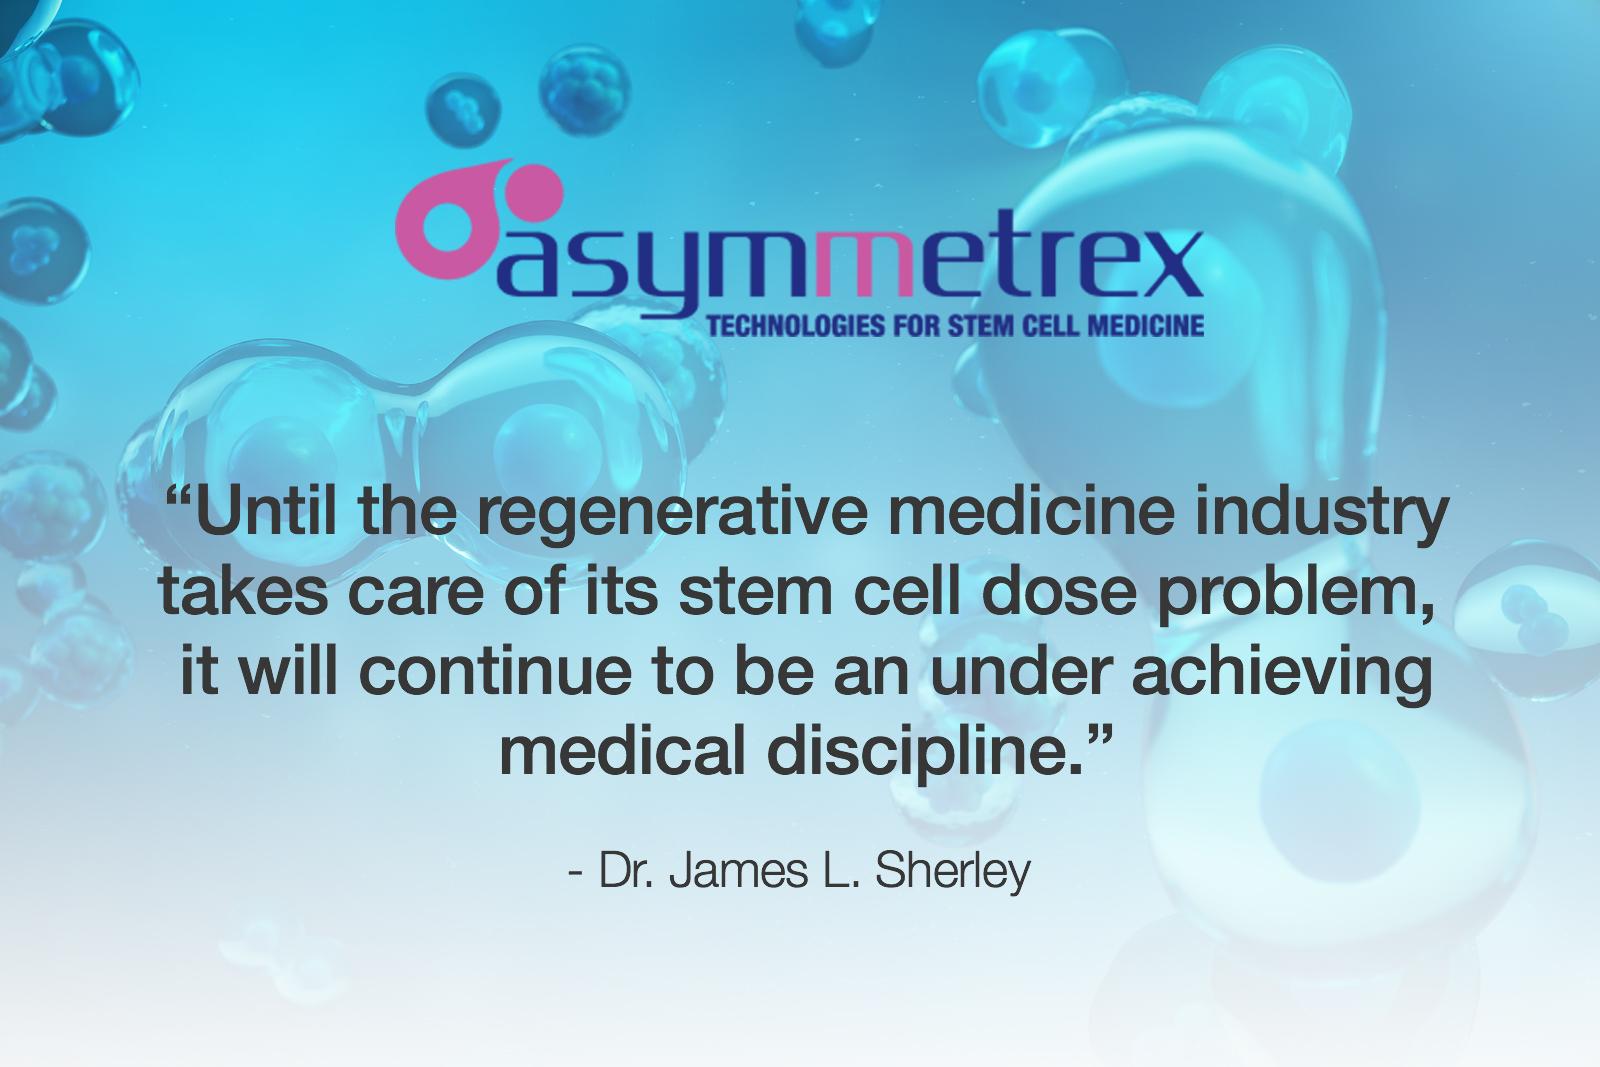 Asymmetrex Revs Up Continuing Education Campaign for Regenerative Medicine